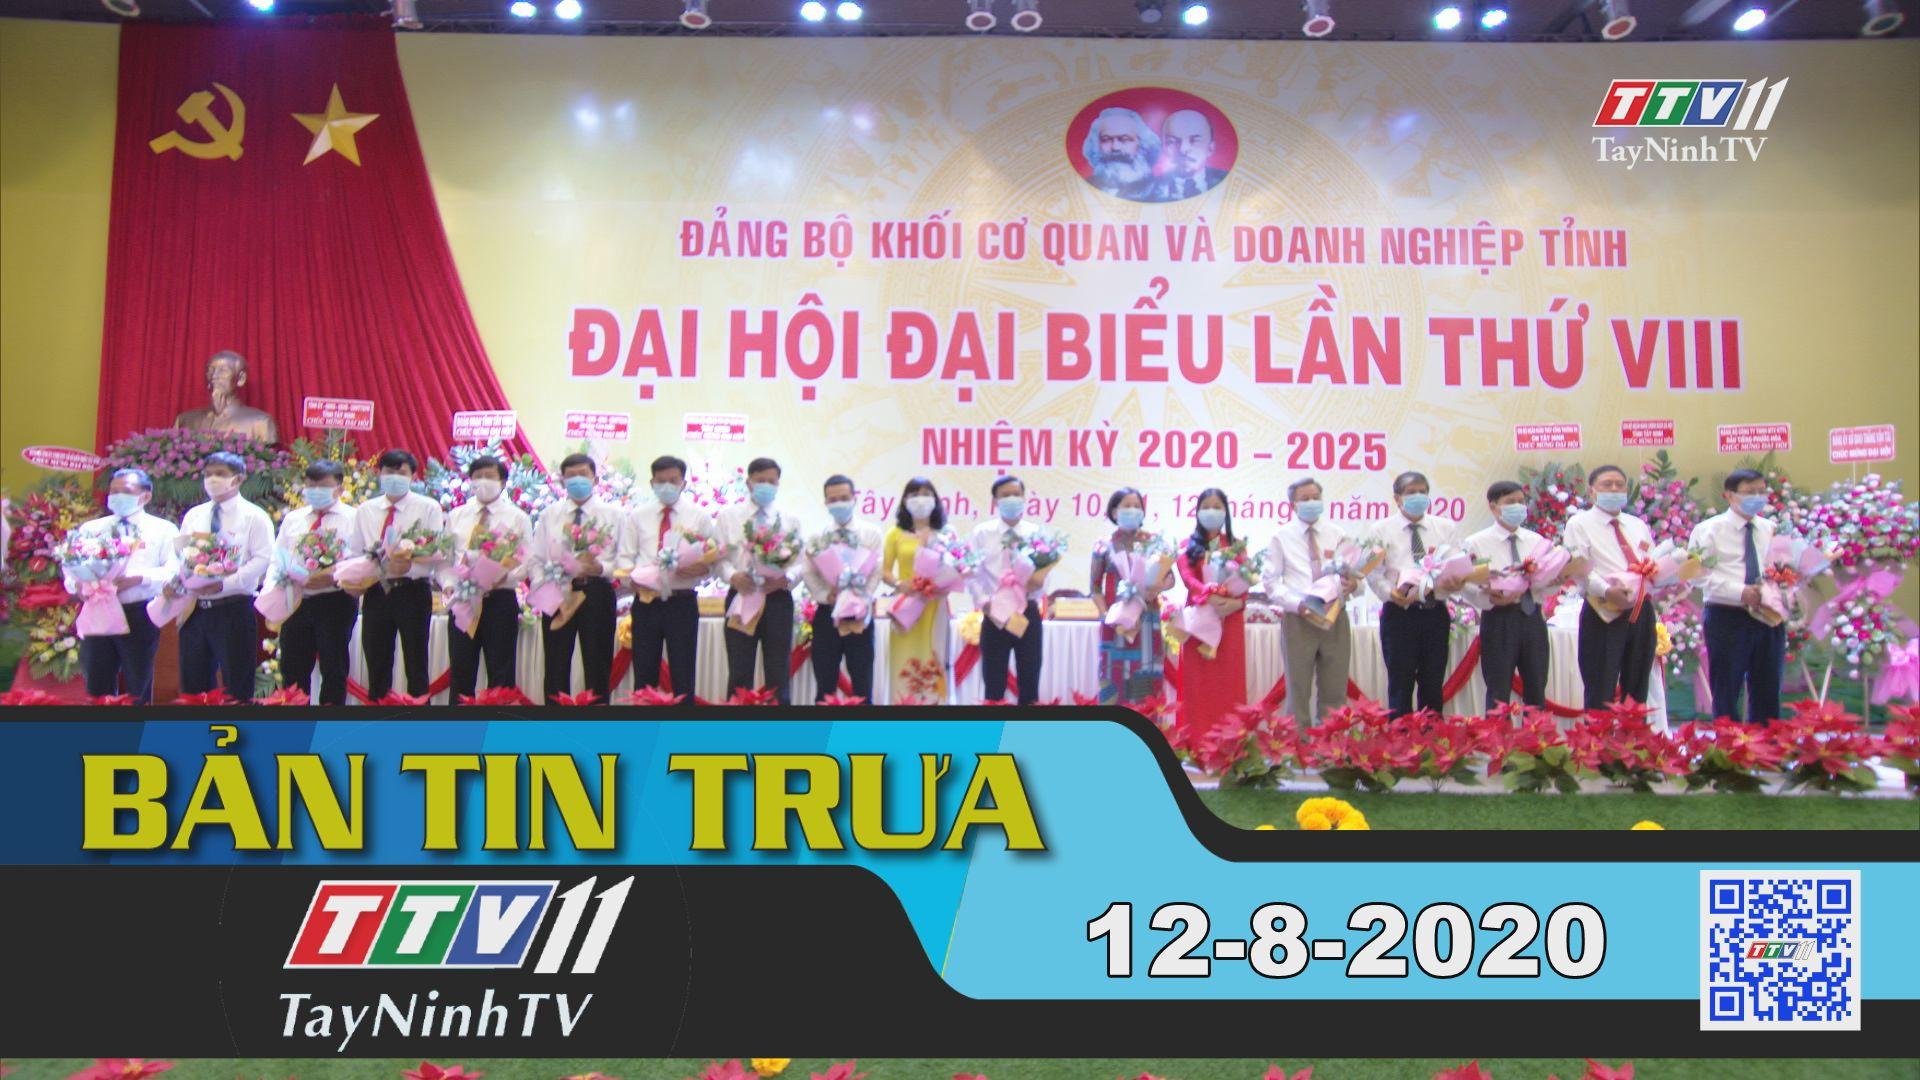 Bản tin trưa 12-8-2020 | Tin tức hôm nay | TayNinhTV